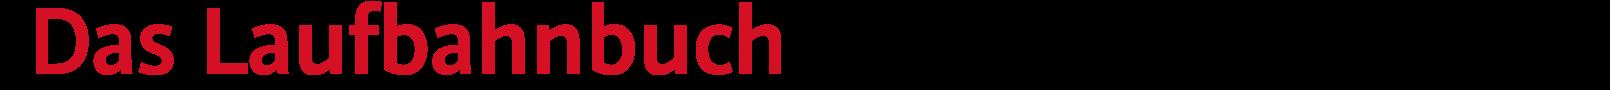 Logo «Das Laufbahnbuch – Laufbahngestaltung, Stellensuche, Bewerbung»